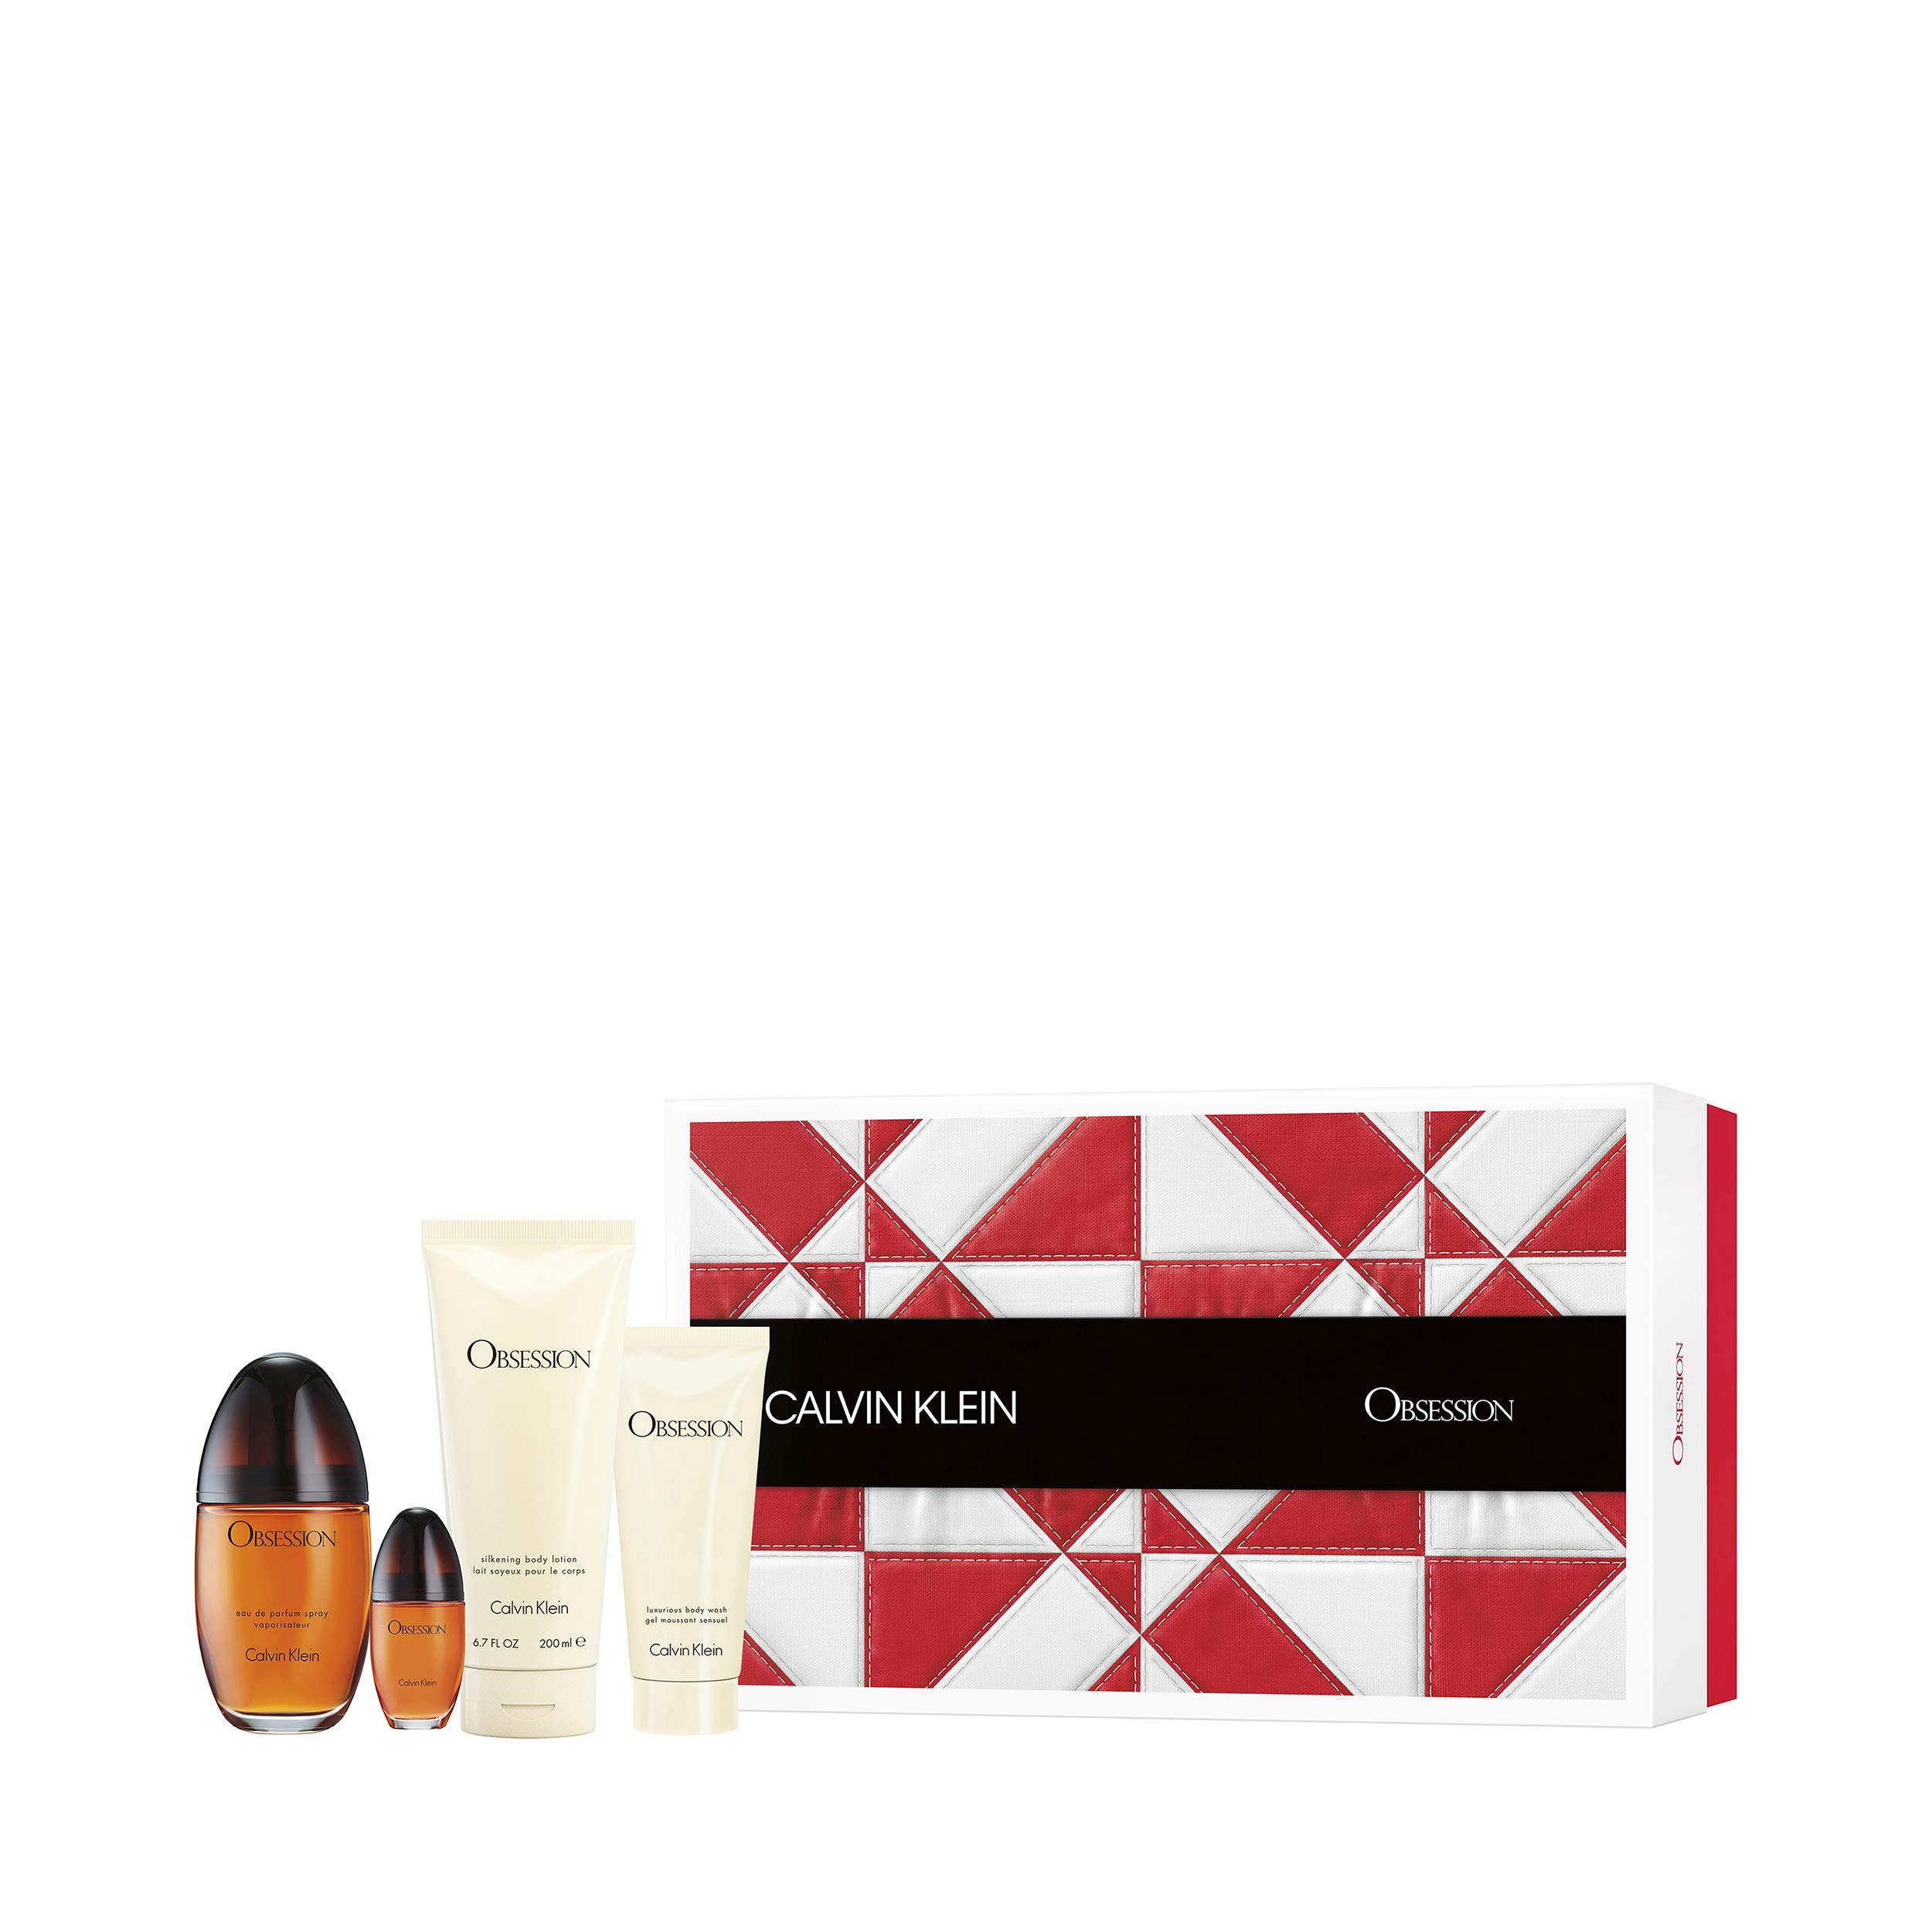 Calvin Klein Obsession for Women Giftset, 13.7 fl. oz. by Calvin Klein